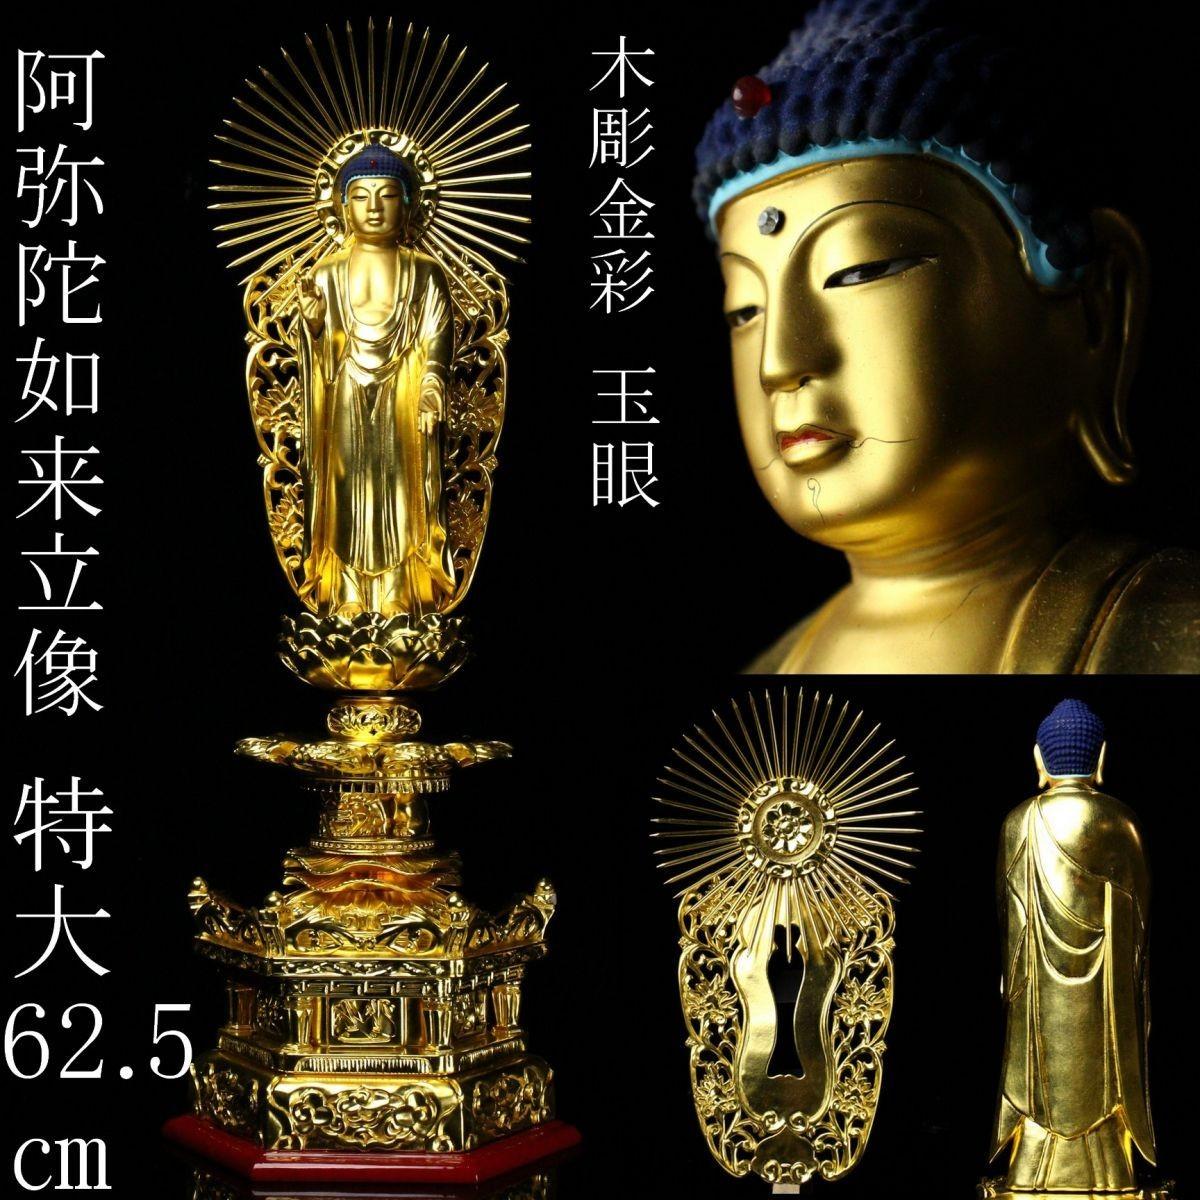 【LIG】仏教美術 木造木彫 金彩玉眼 阿弥陀如来立像 特大62.5㎝ 細密造 寺院引取品 [.YW]11櫻